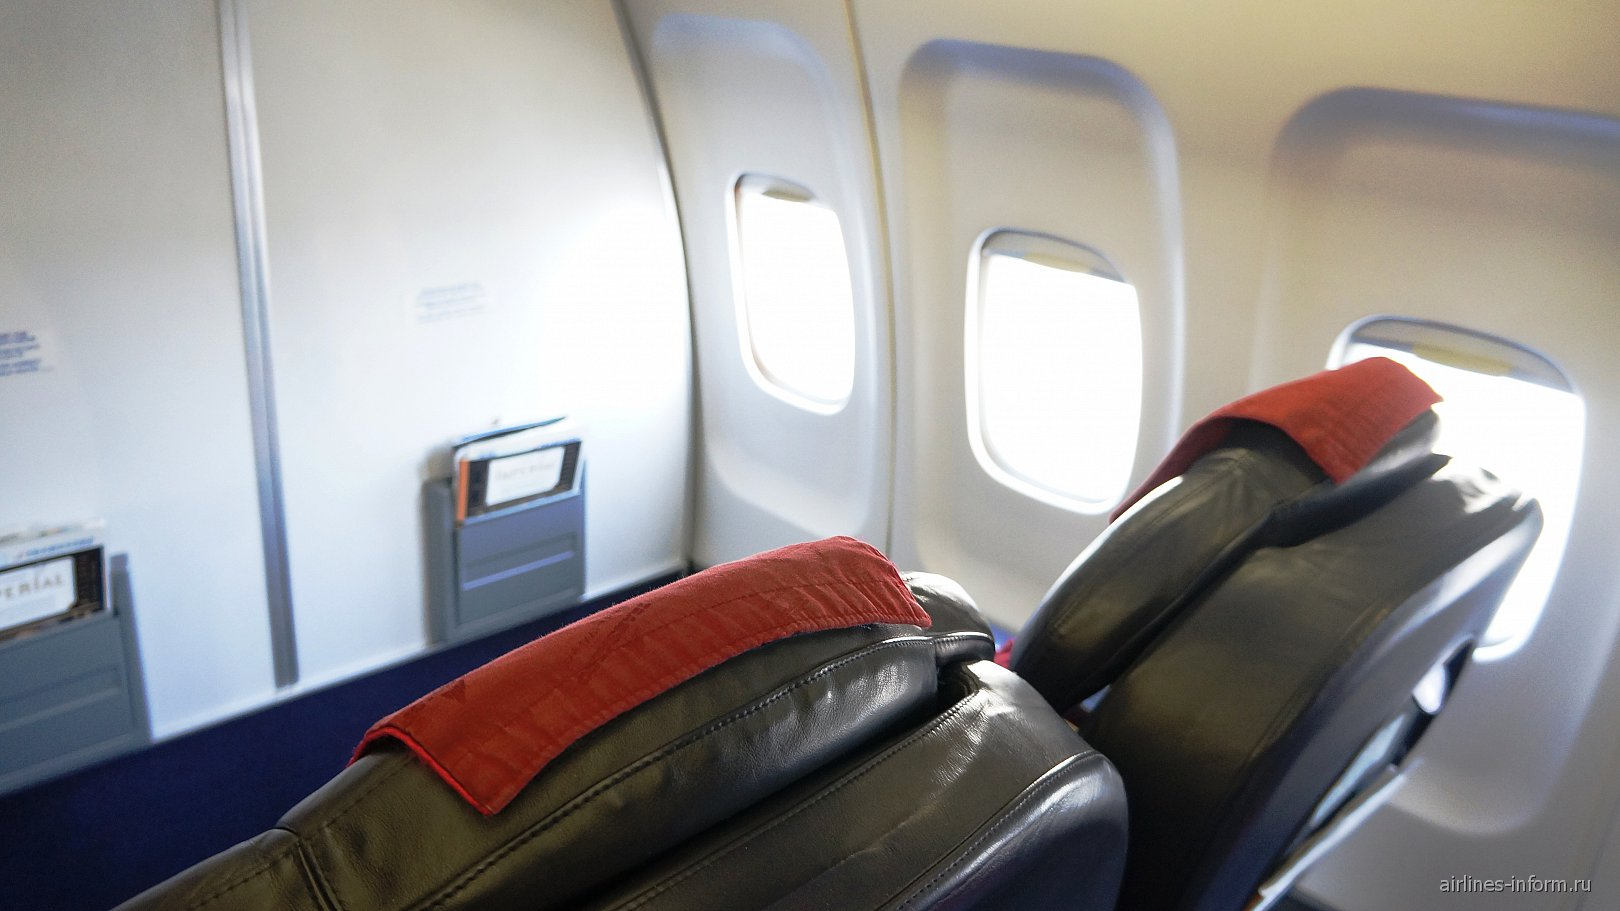 Бизнес-класс самолета Ту-214 авиакомпании Трансаэро